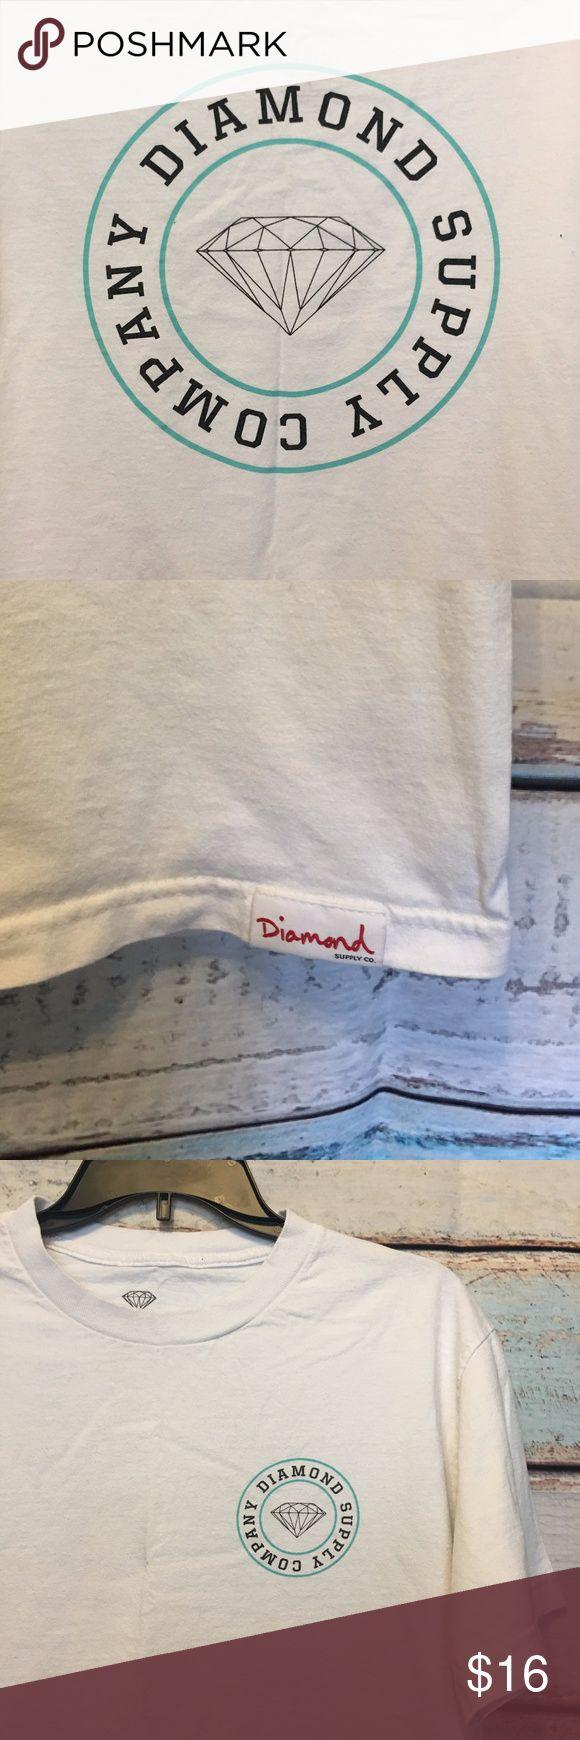 Diamond Supply Company T-Shirt Diamond Supply Company T-Shirt. Size M. 100% Cotton. Pre-loved. No stains or holes. Diamond Supply Co. Tops Tees - Short Sleeve